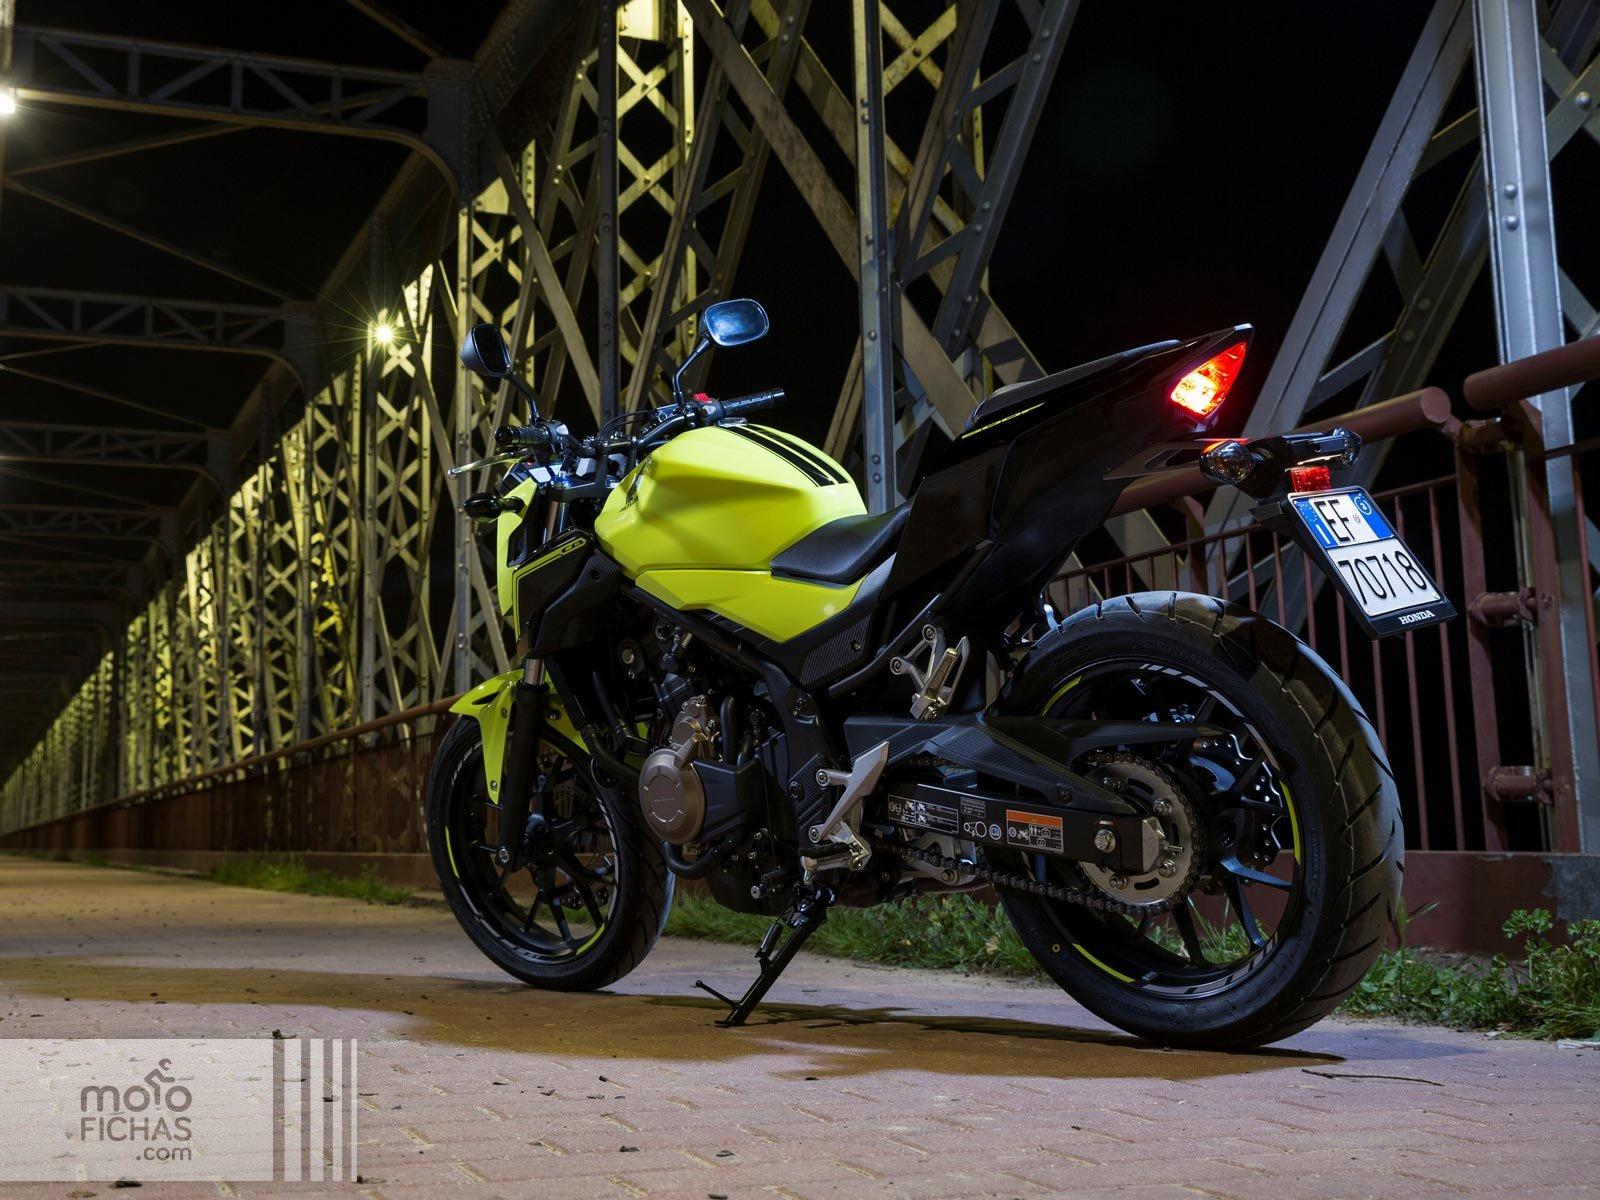 2017 Honda CB500F Price, Trims, Options, Specs, Photos